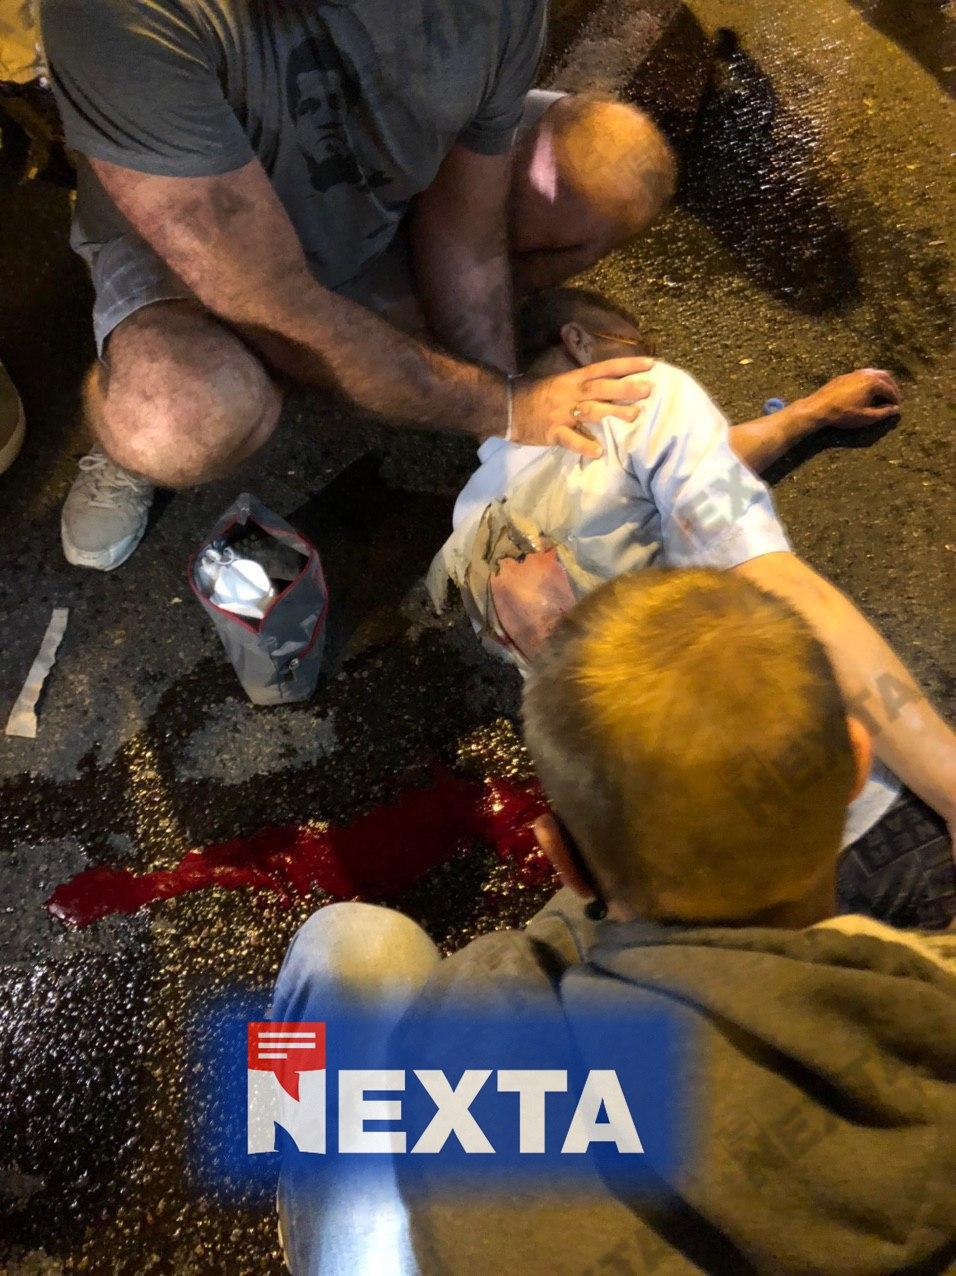 В Минске силовики применяют светошумовые гранаты на Пушкинской площади - фото 1